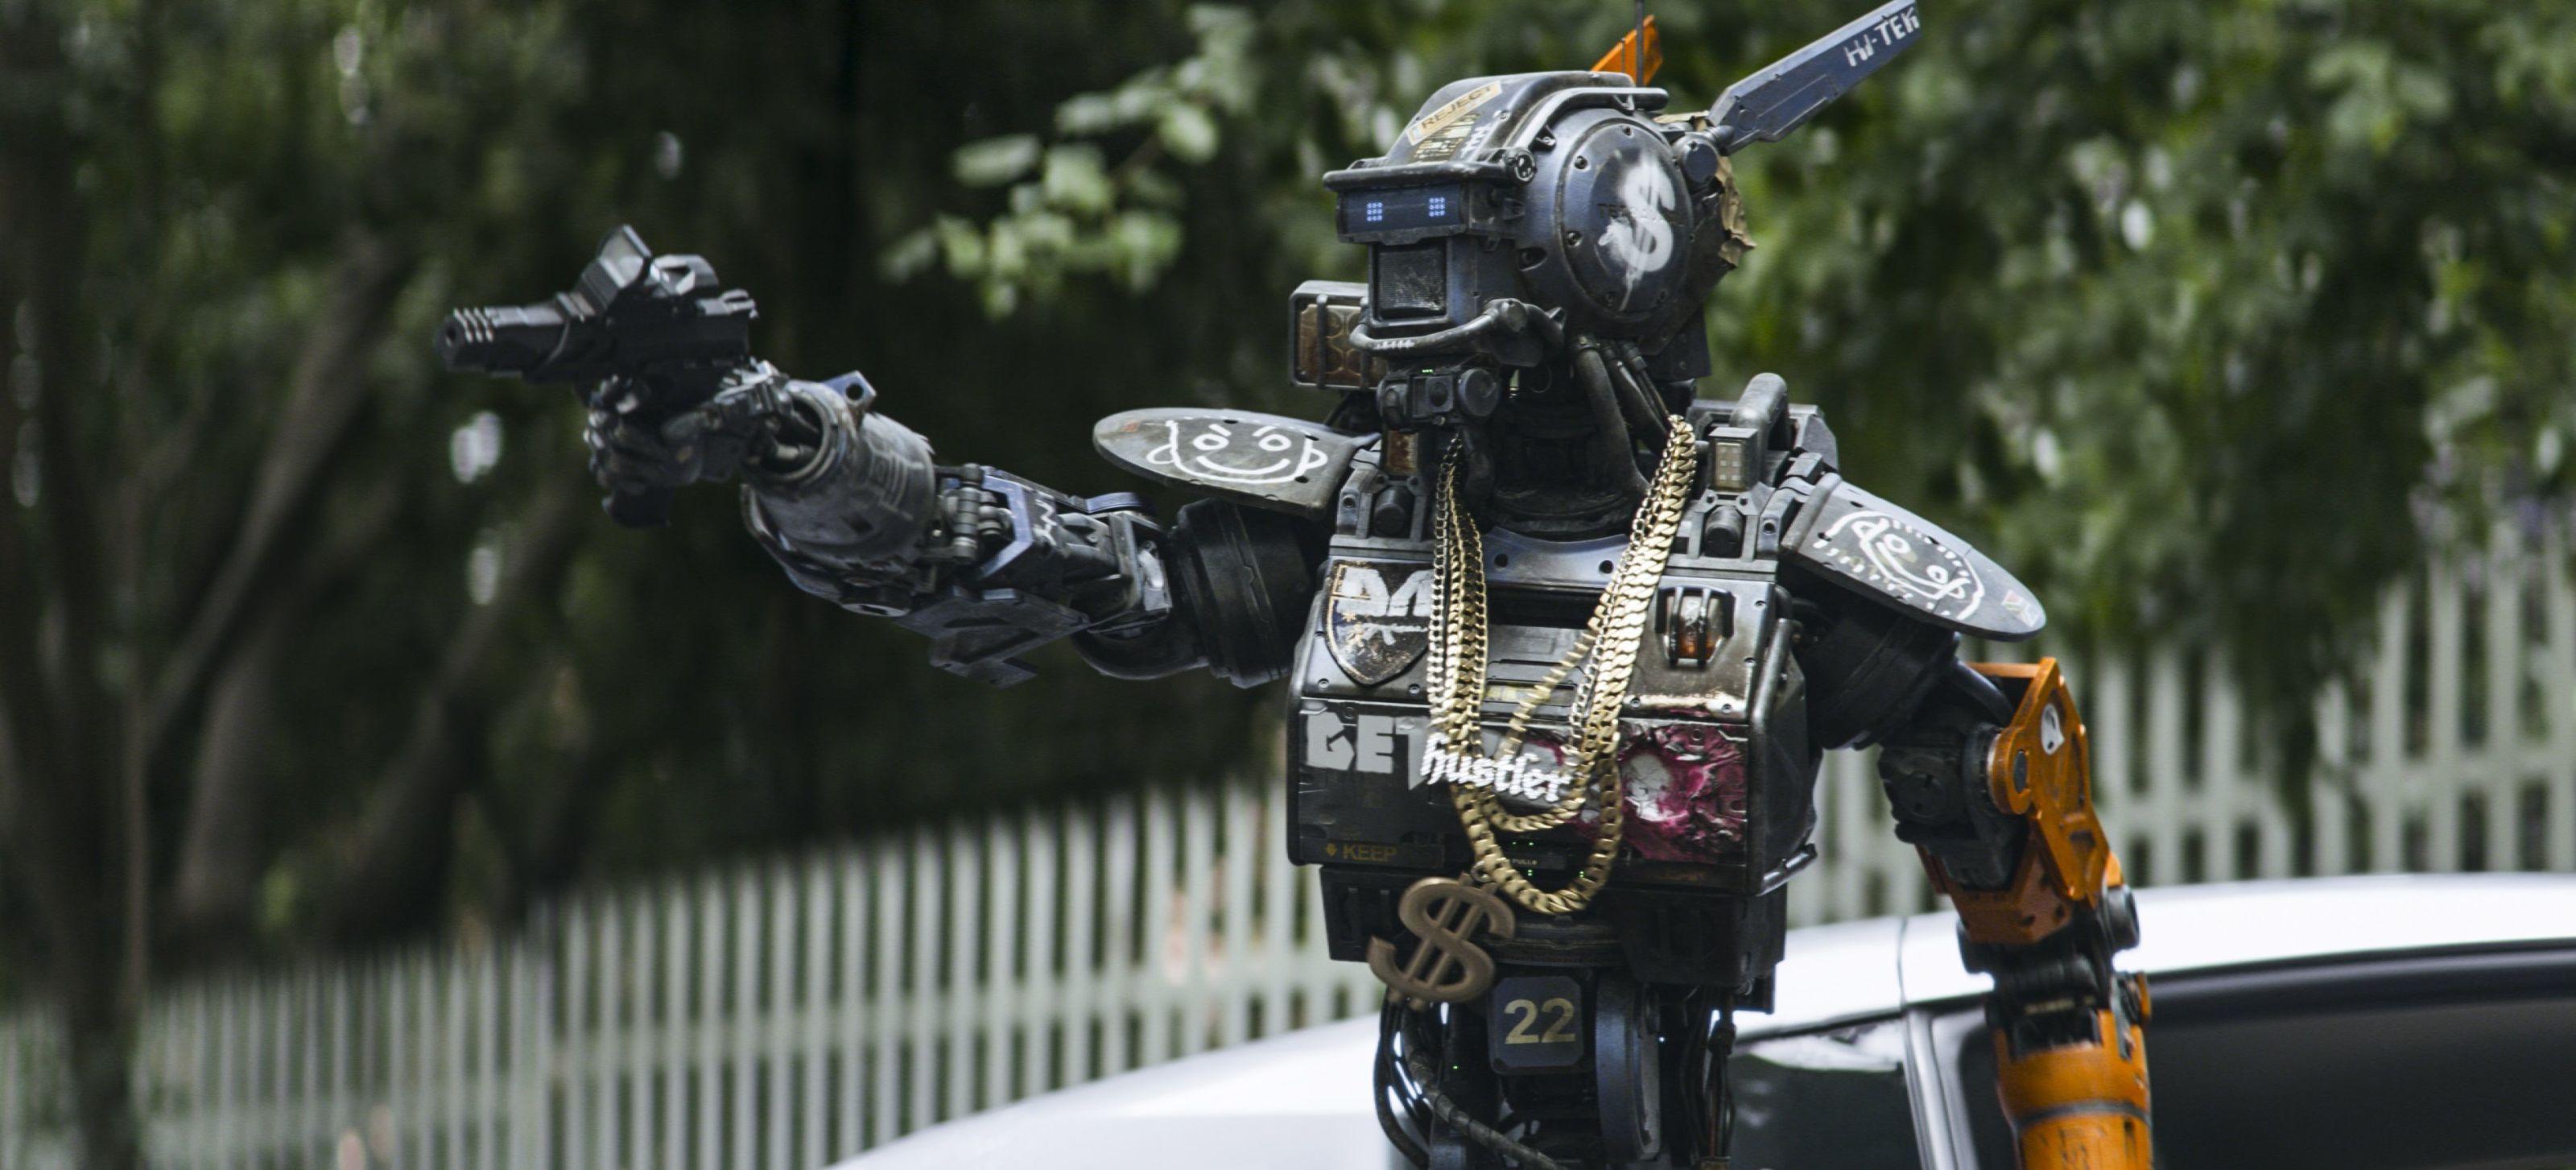 Neill Blomkamp: Artificial Intelligence Will Do What It Wants